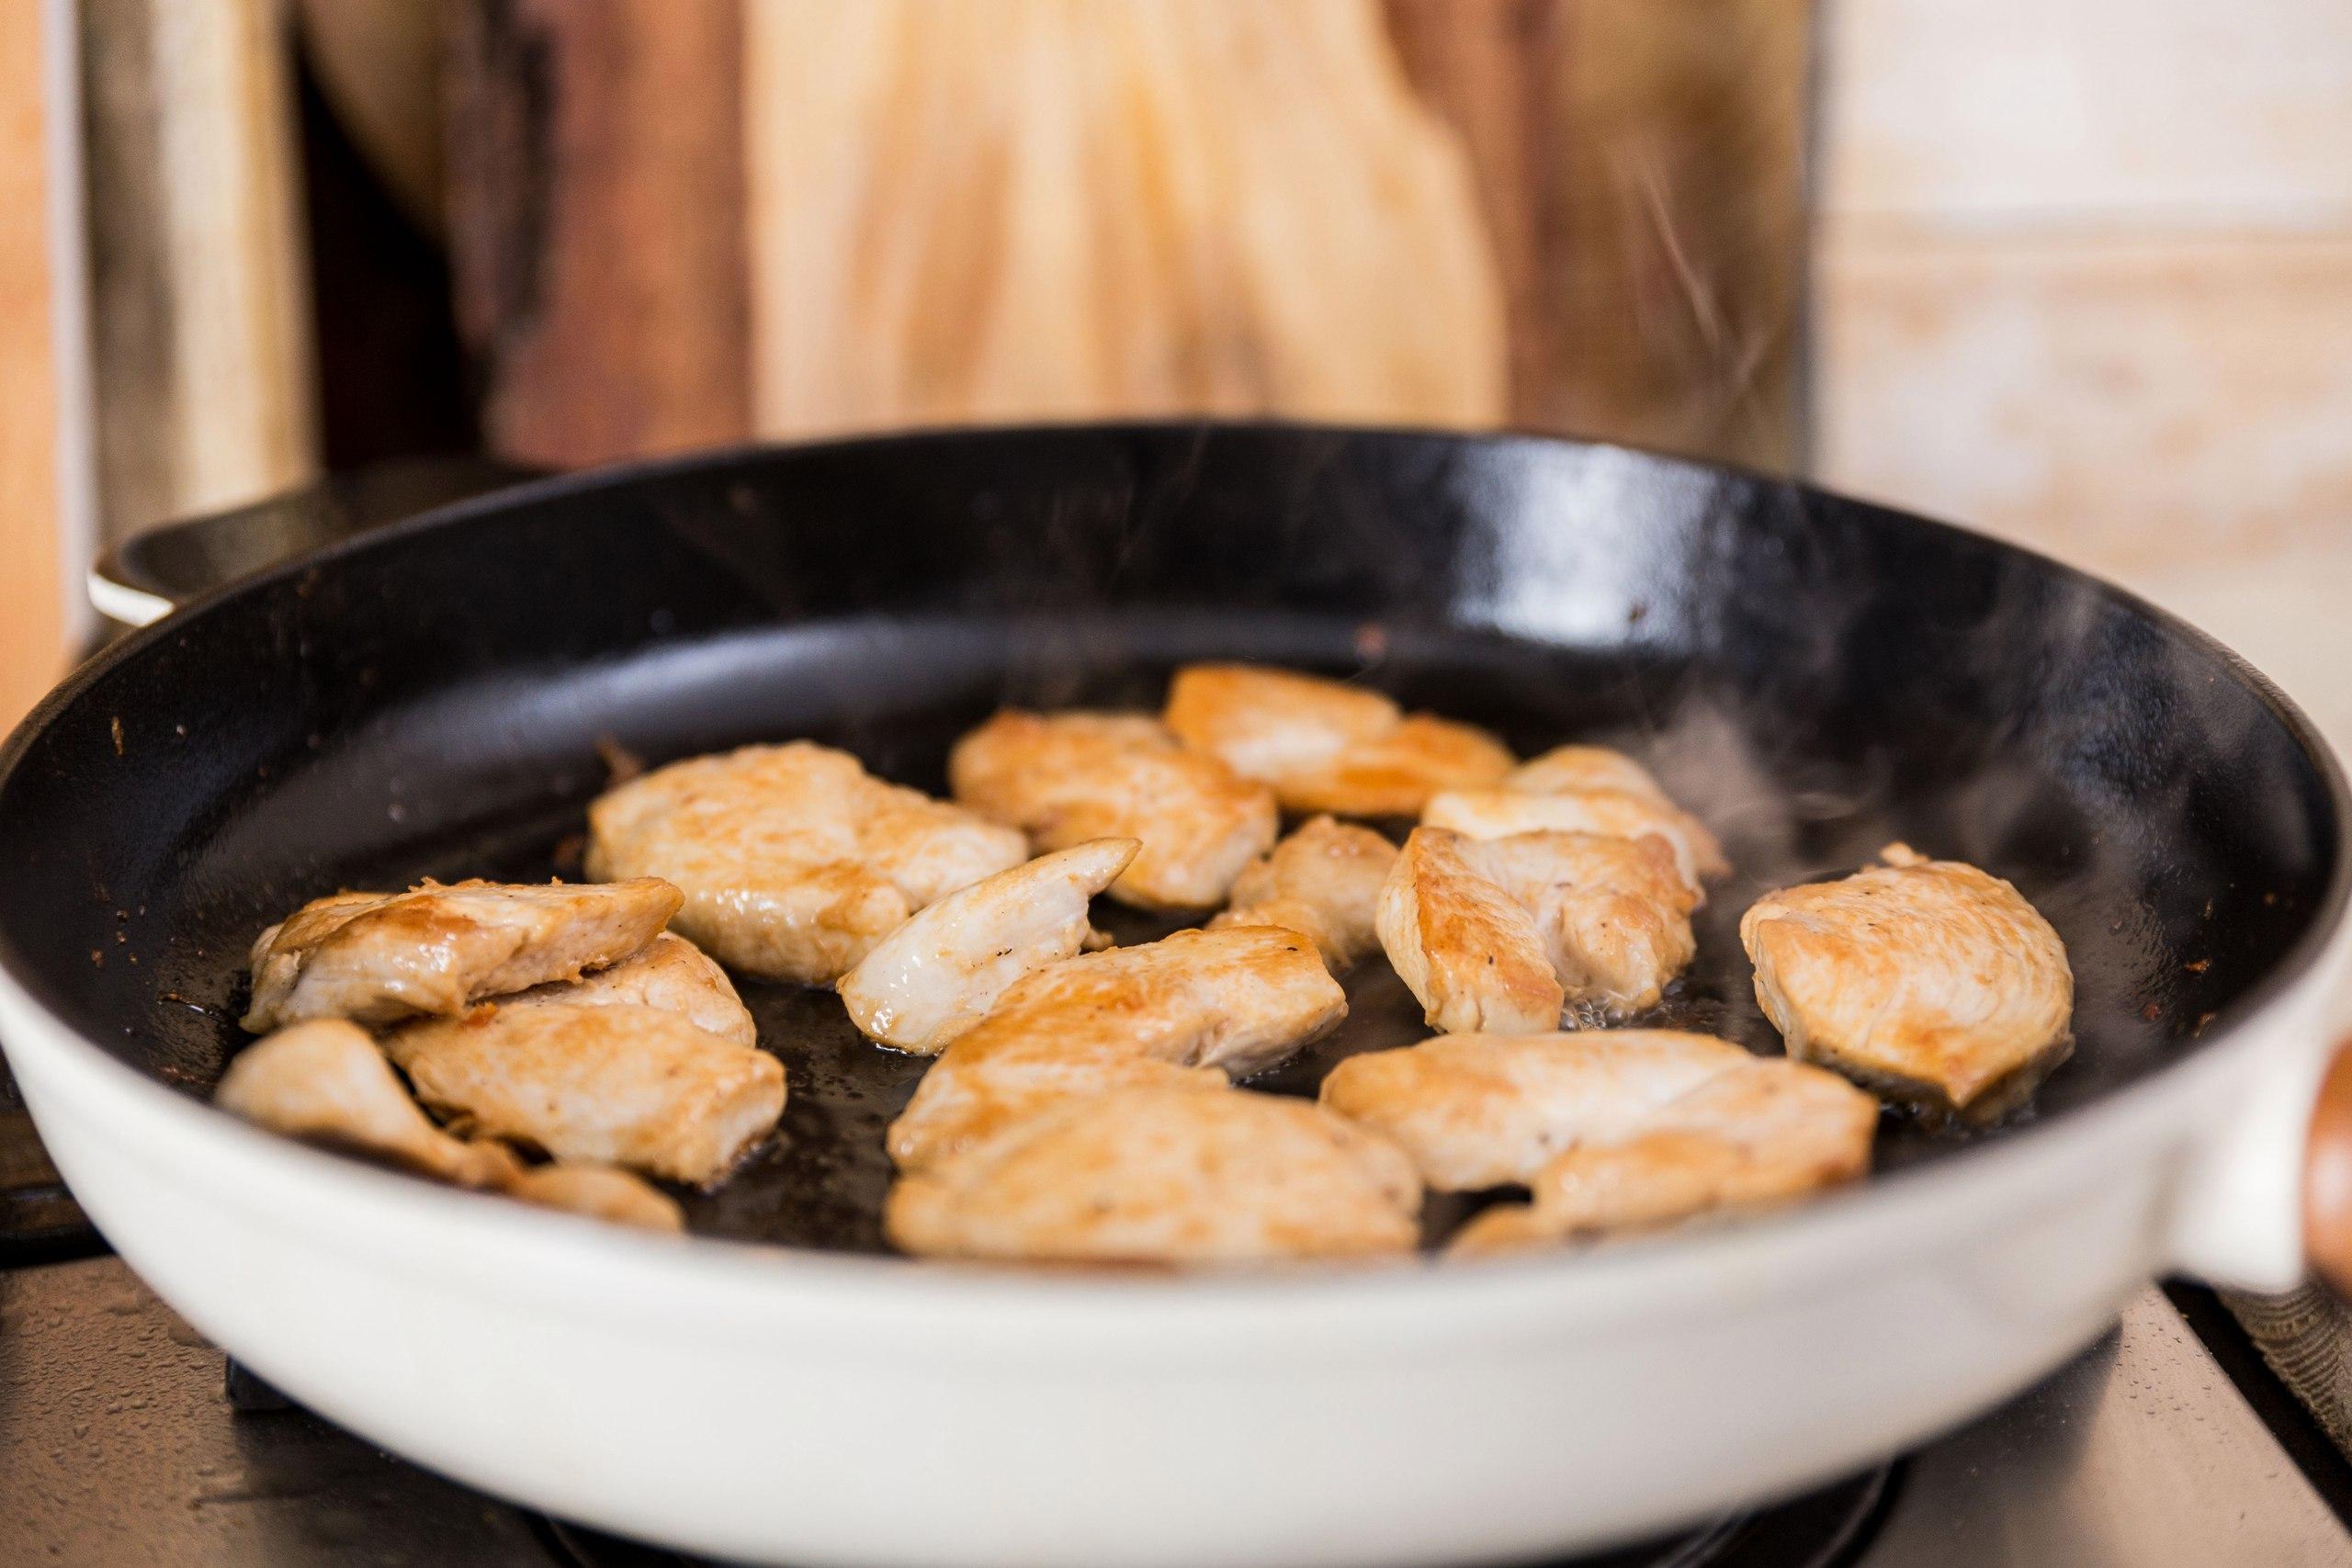 Курица по-индийски (карри) Ингредиенты: Куриное филе — 400 г Репчатый